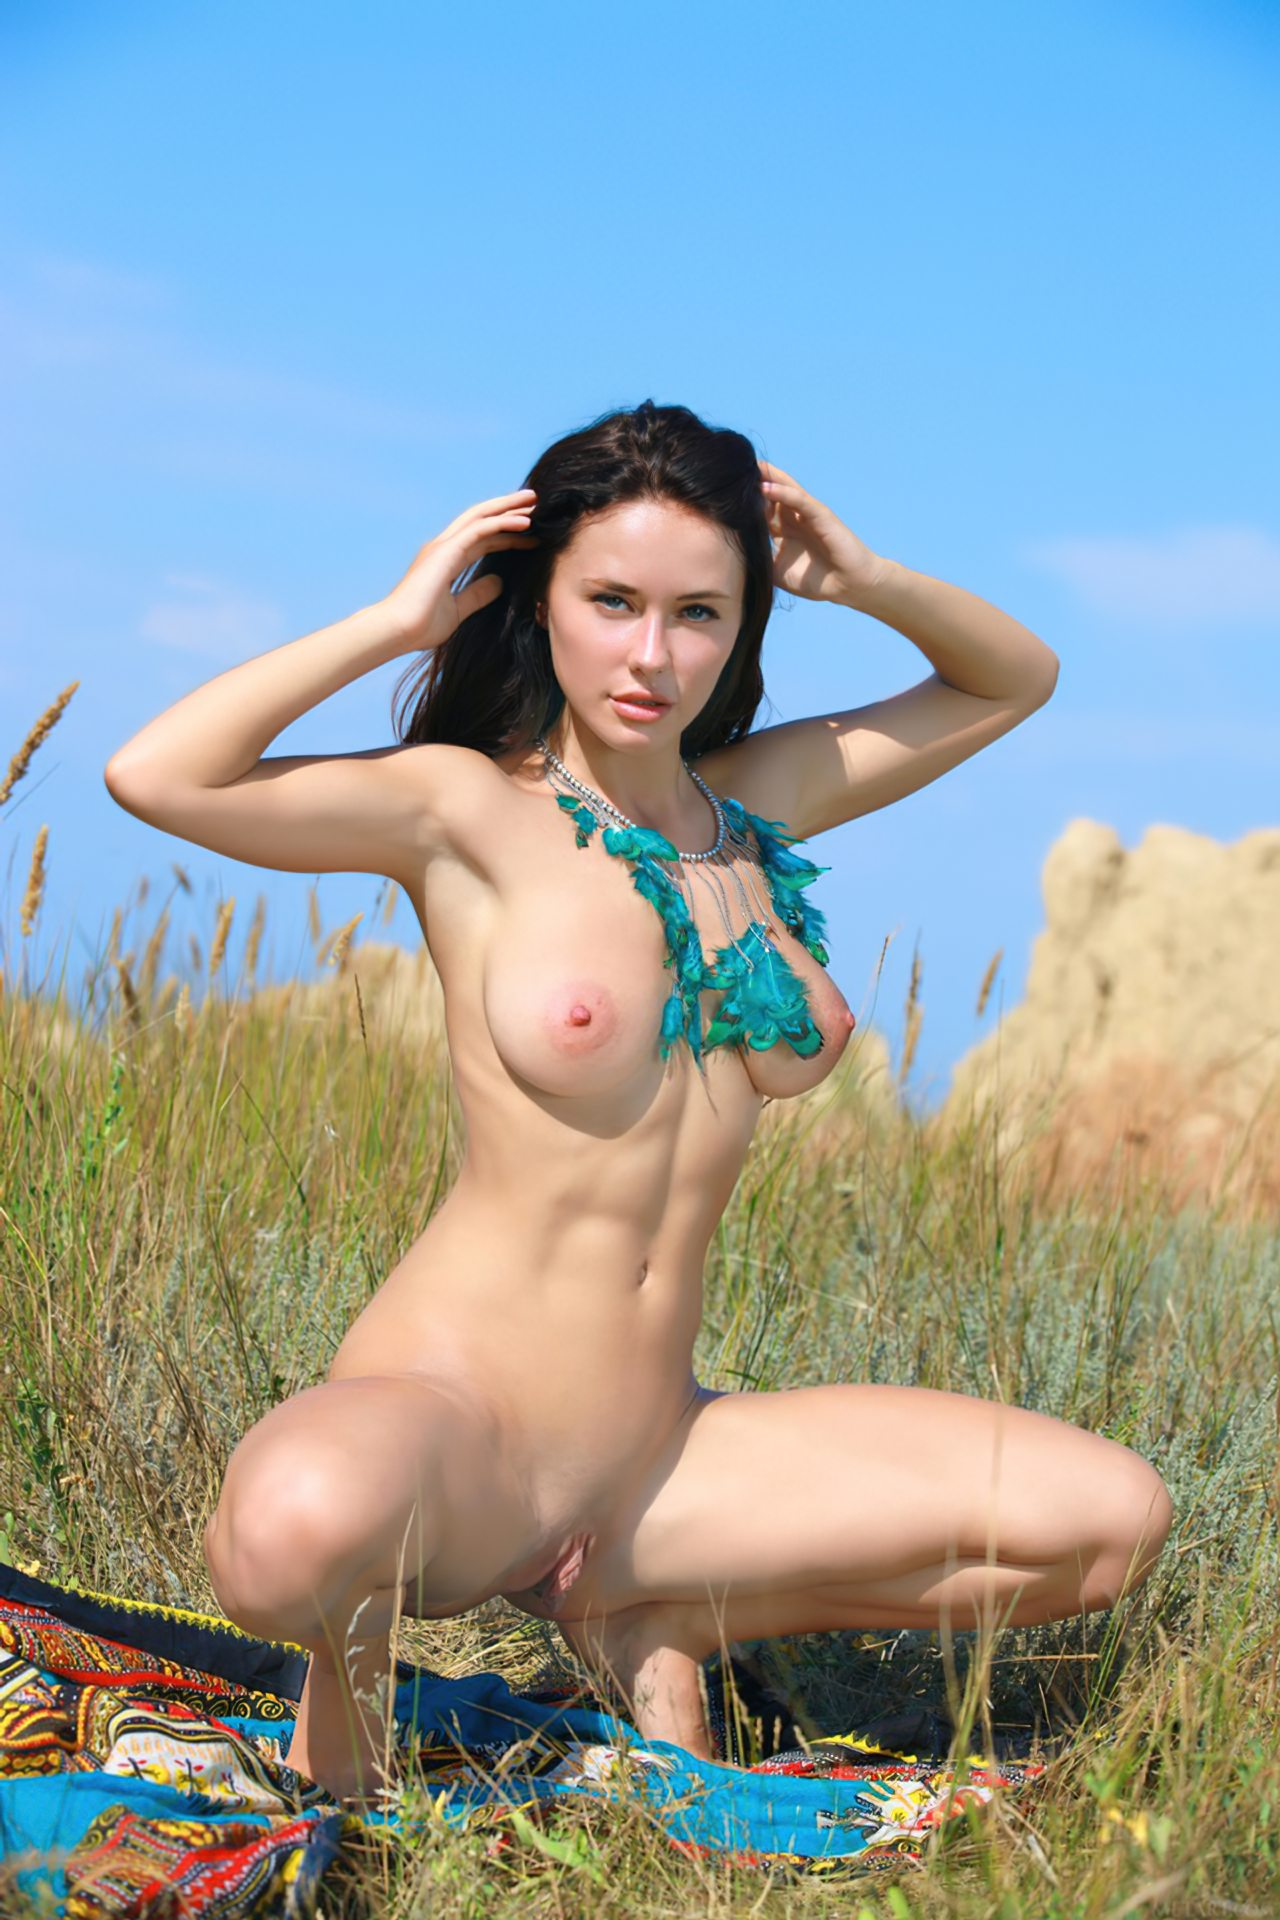 Mulheres Nuas Fotos (7)